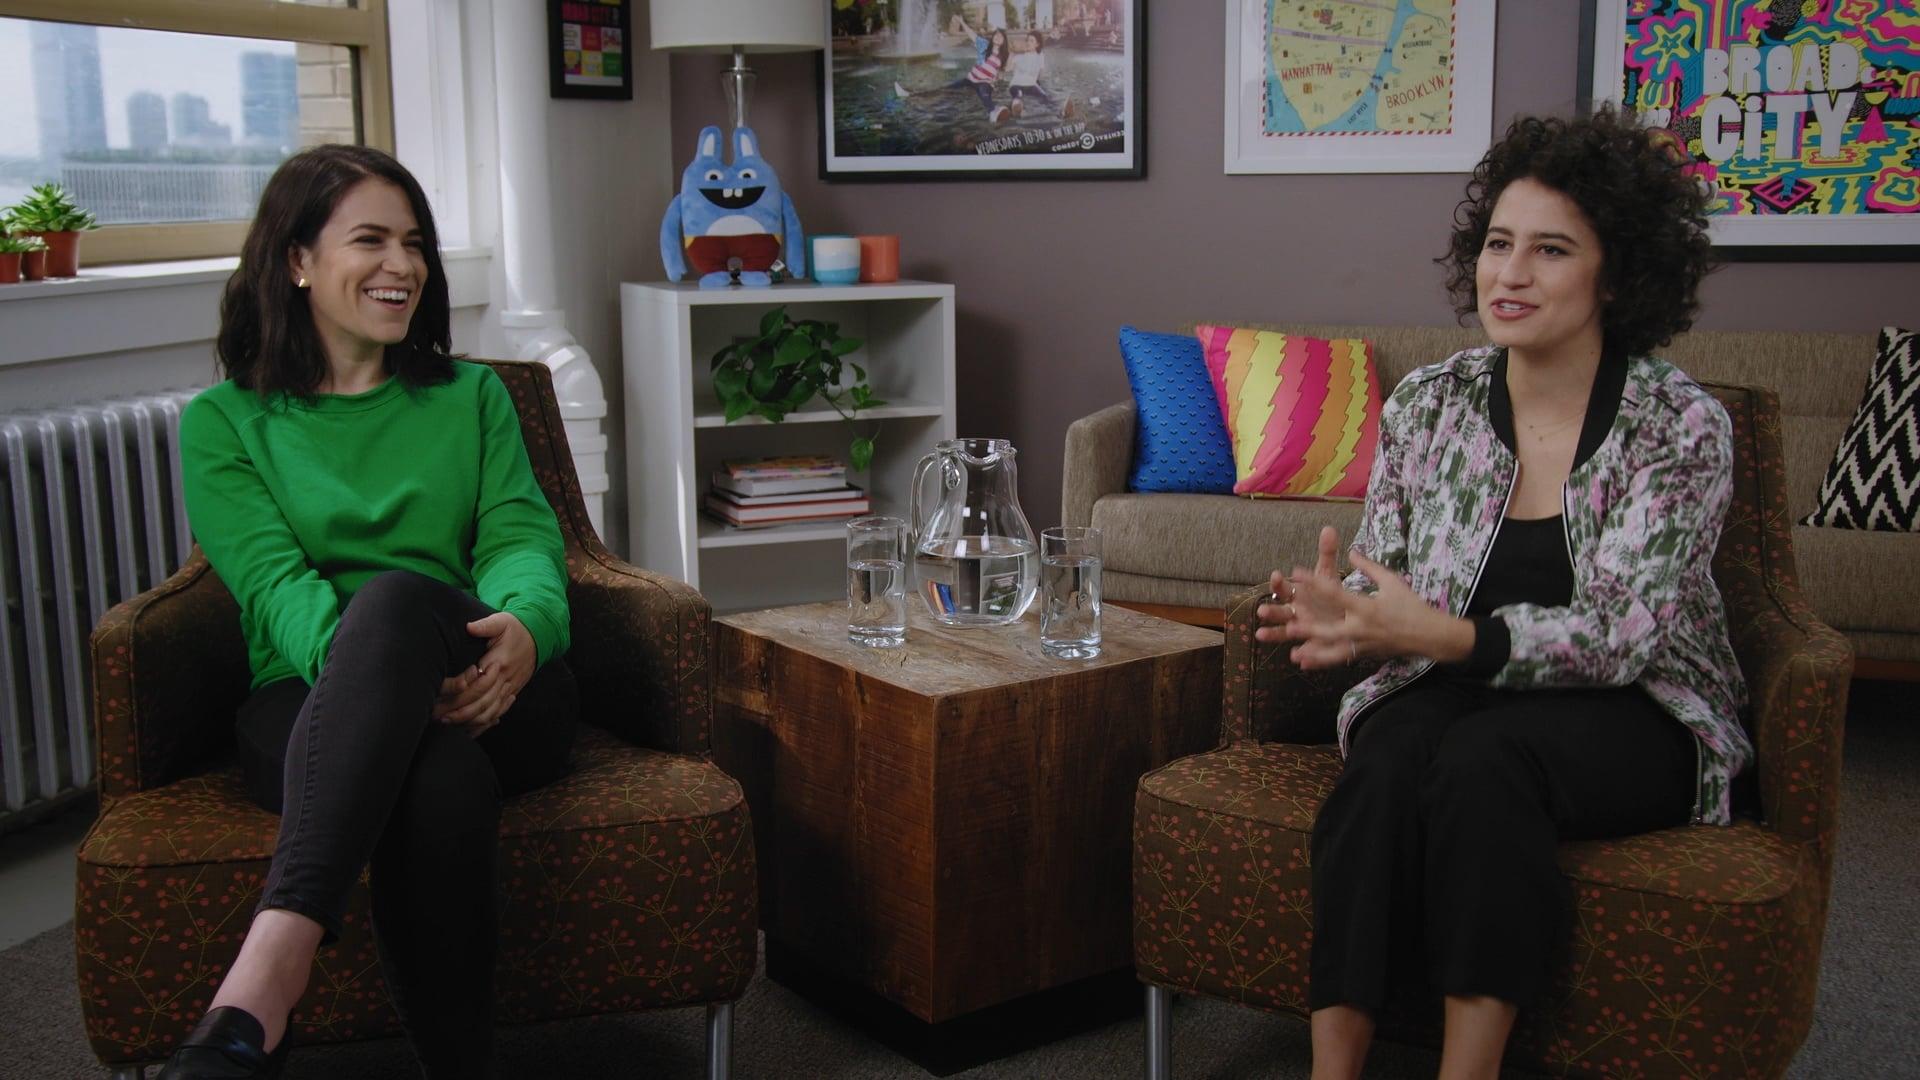 Broad City Season 4 Episode 5 Openload Watch Online Full